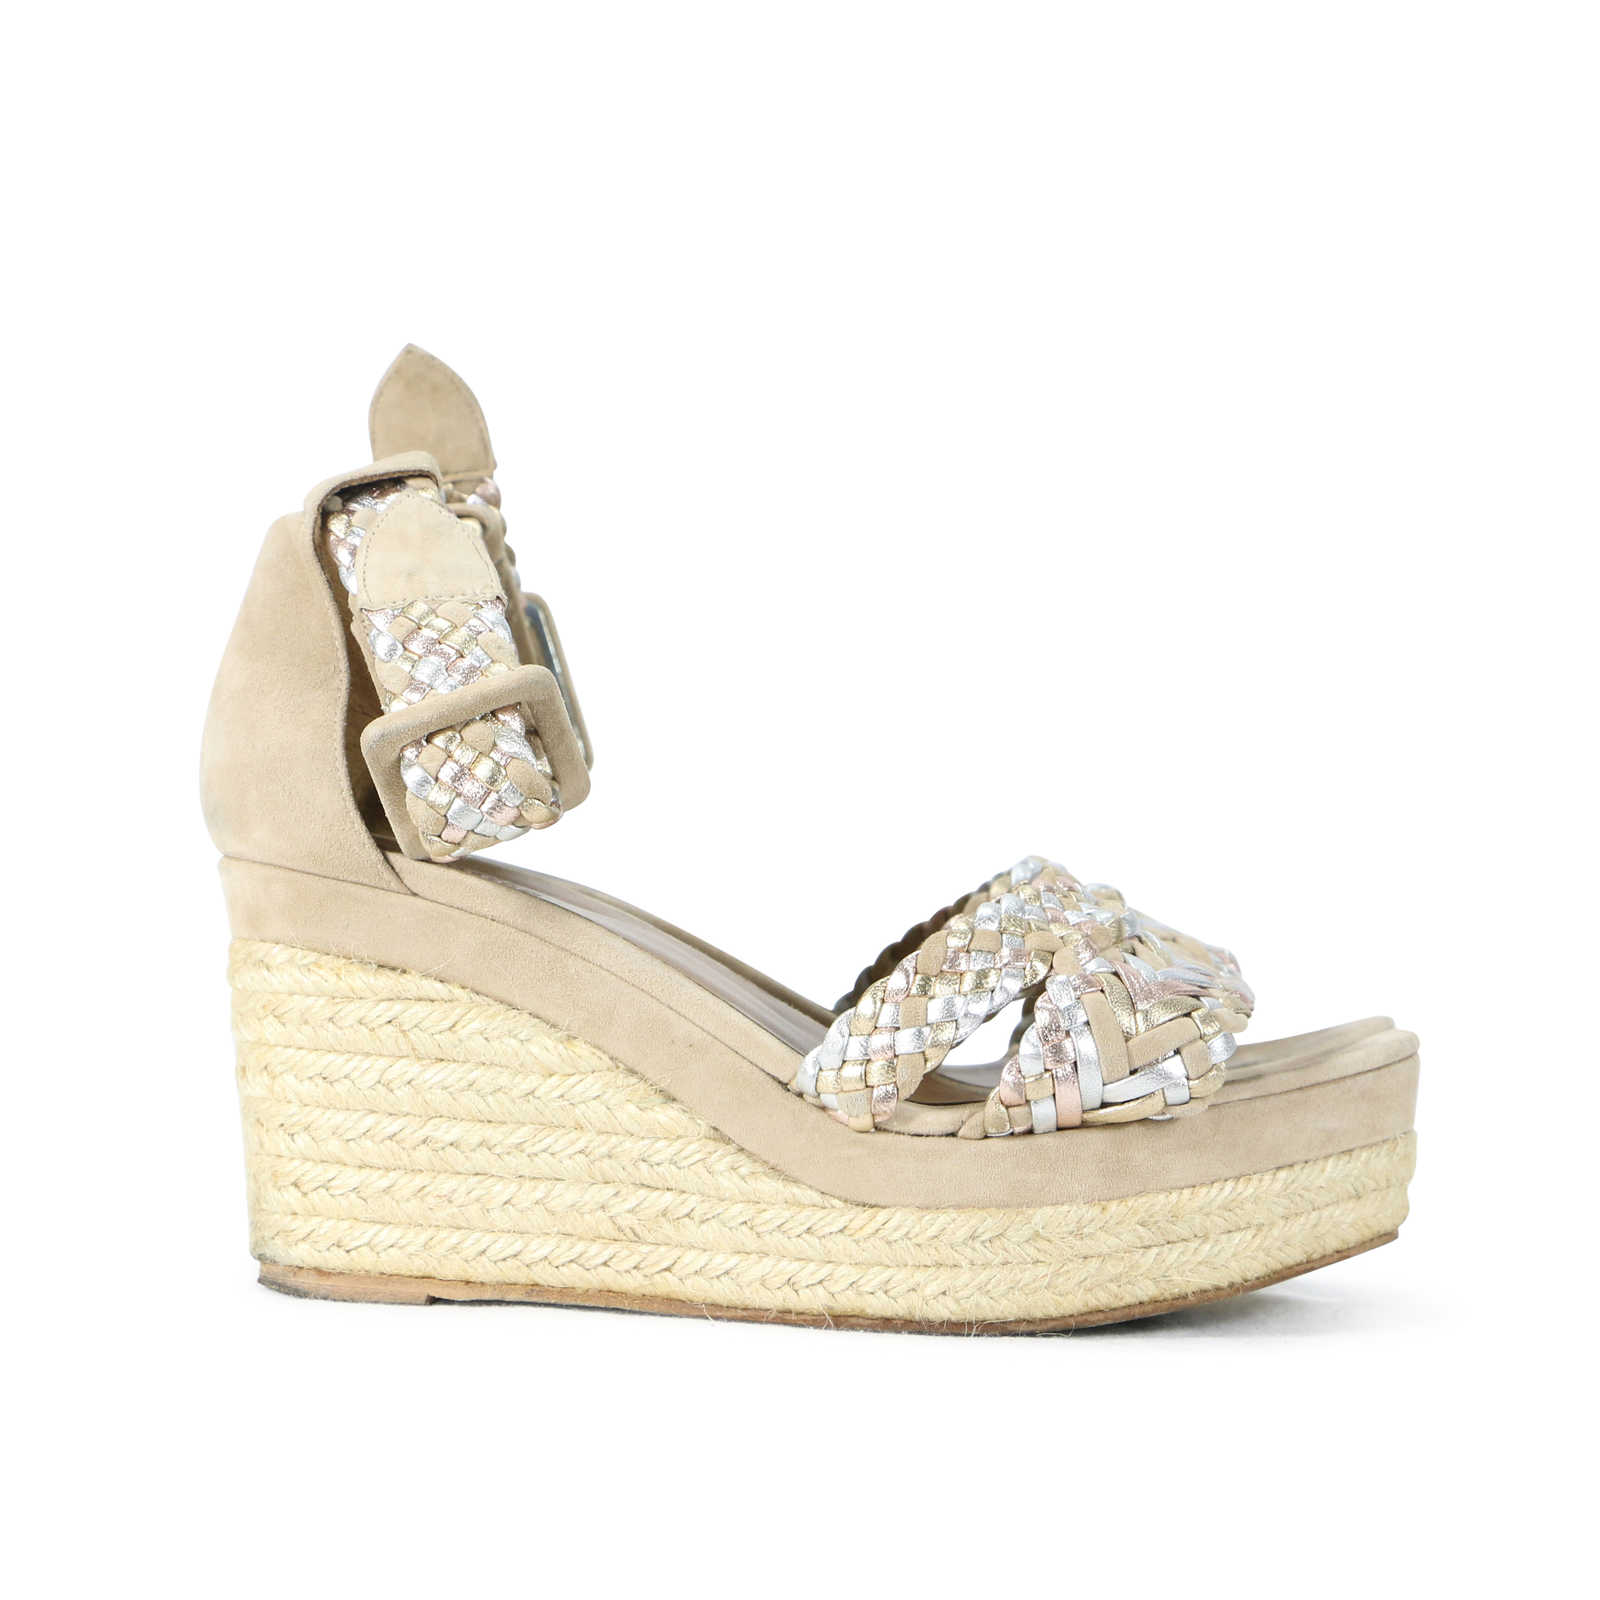 buy cheap perfect Hermès Braided Espadrille Wedge Sandals visa payment online newest sale online discount nicekicks 3NuYydJ